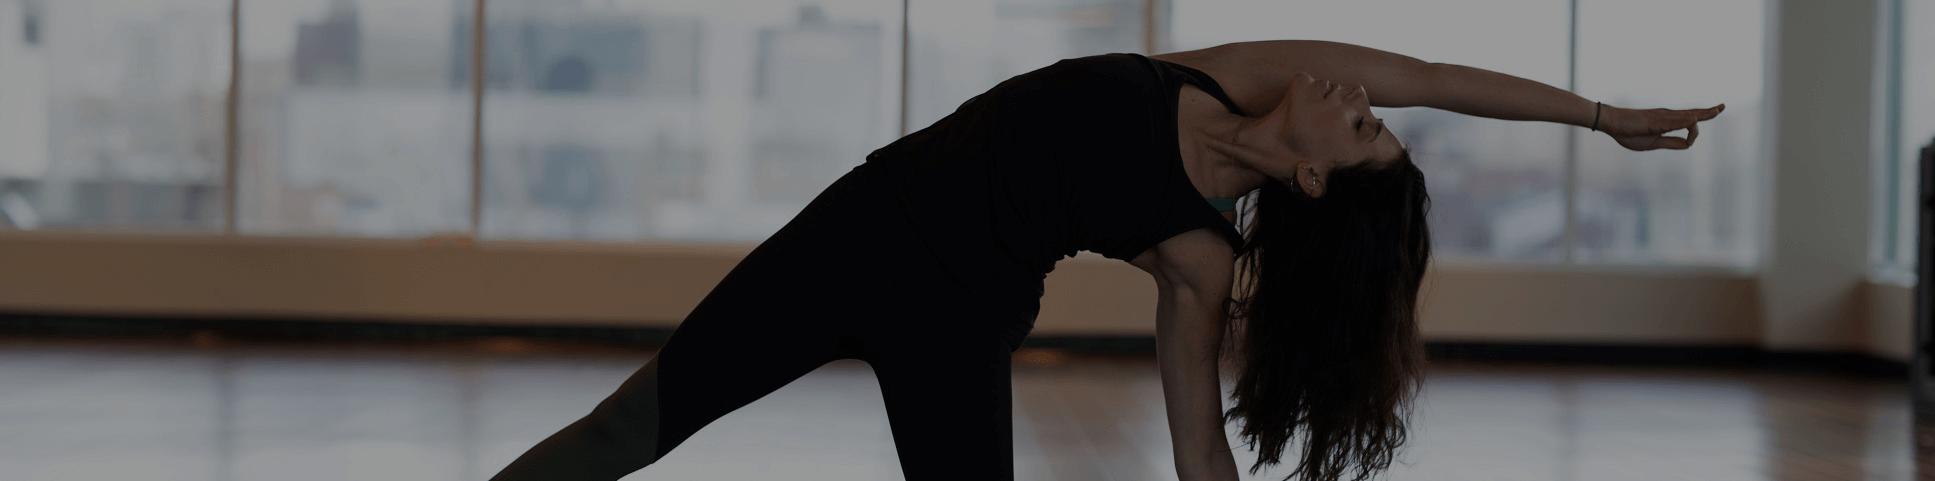 Yoga TT Header crop tint